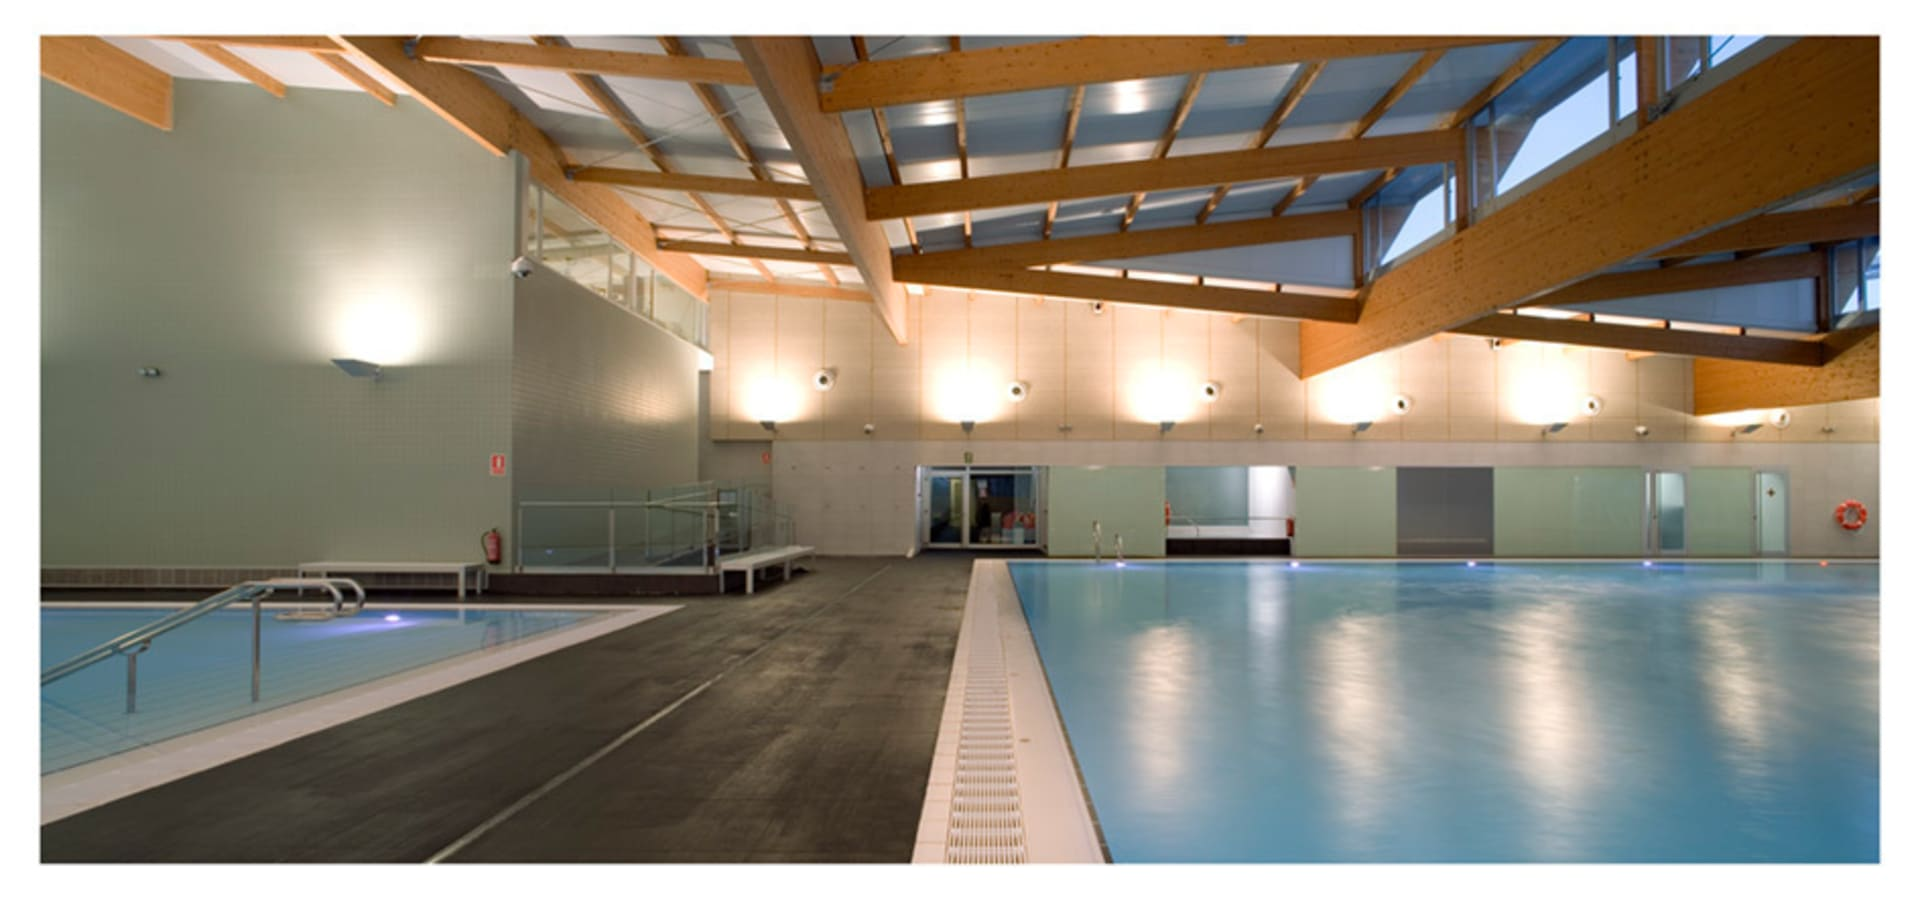 Centro deportivo ekke de pallej le n arquitectes slp homify for Gimnasio 704 h arquitectes